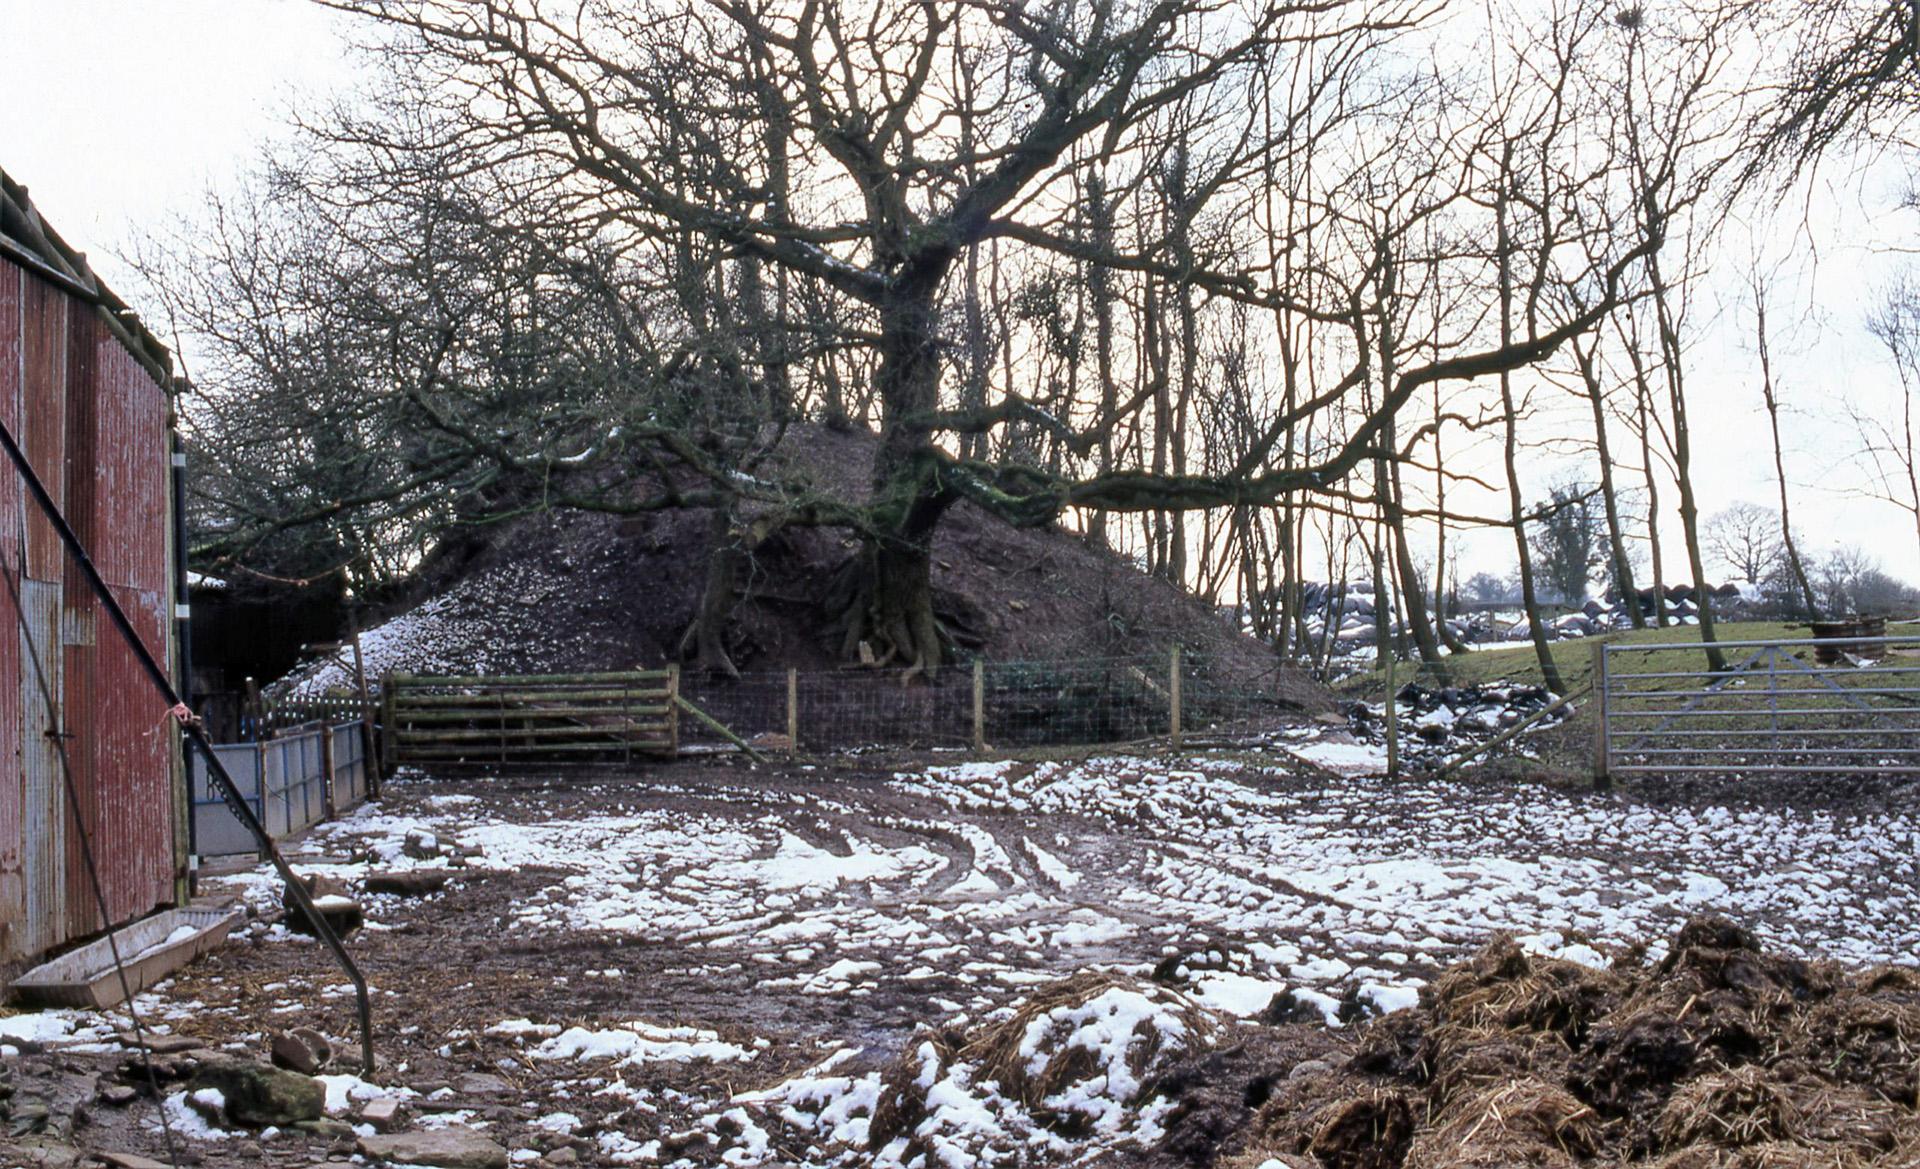 Newcastle Mound